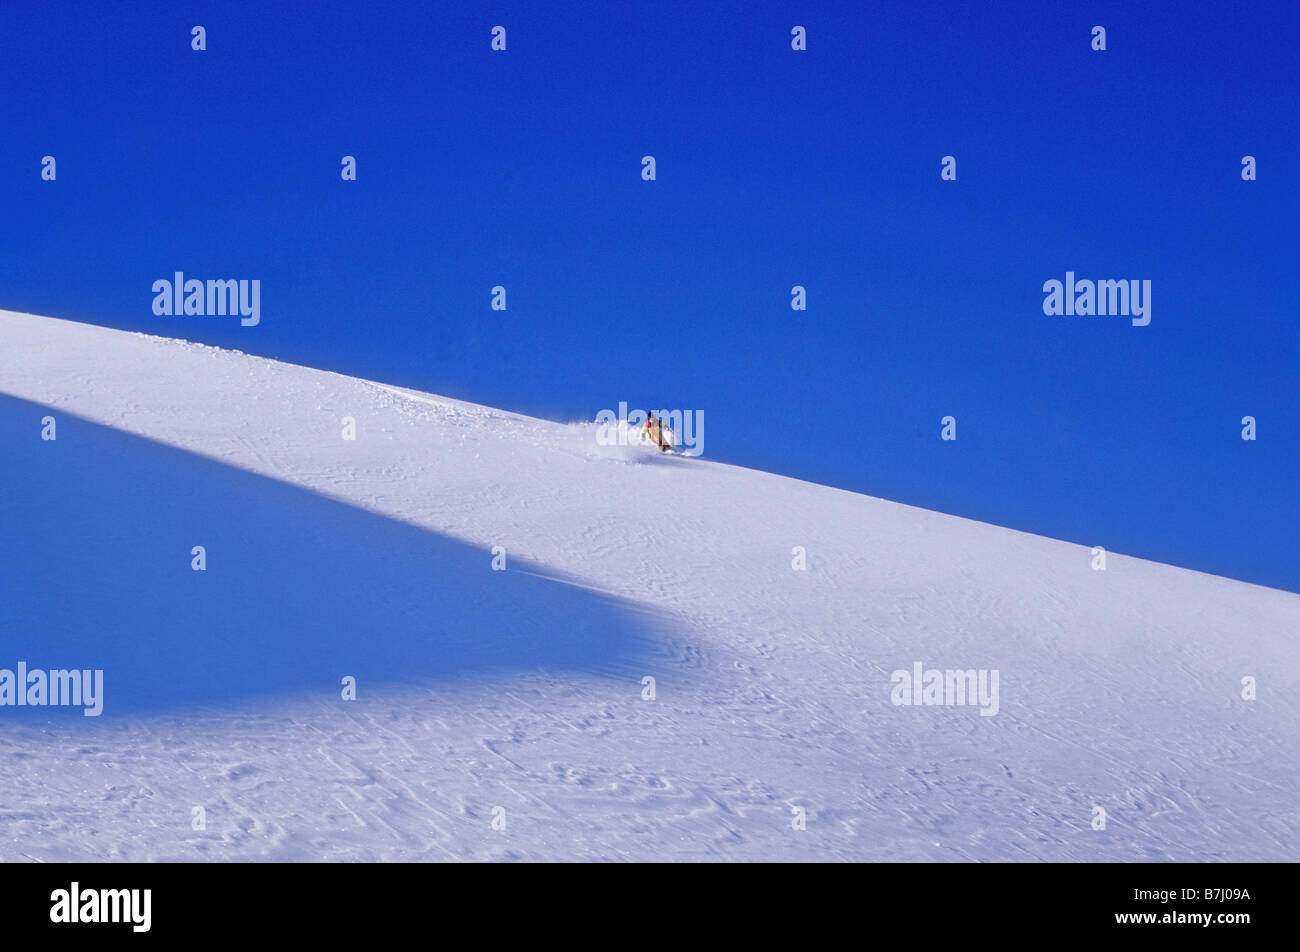 Heli-skier on clean mountain glacier, blue sky, Pemberton Ice Cap, B.C. - Stock Image